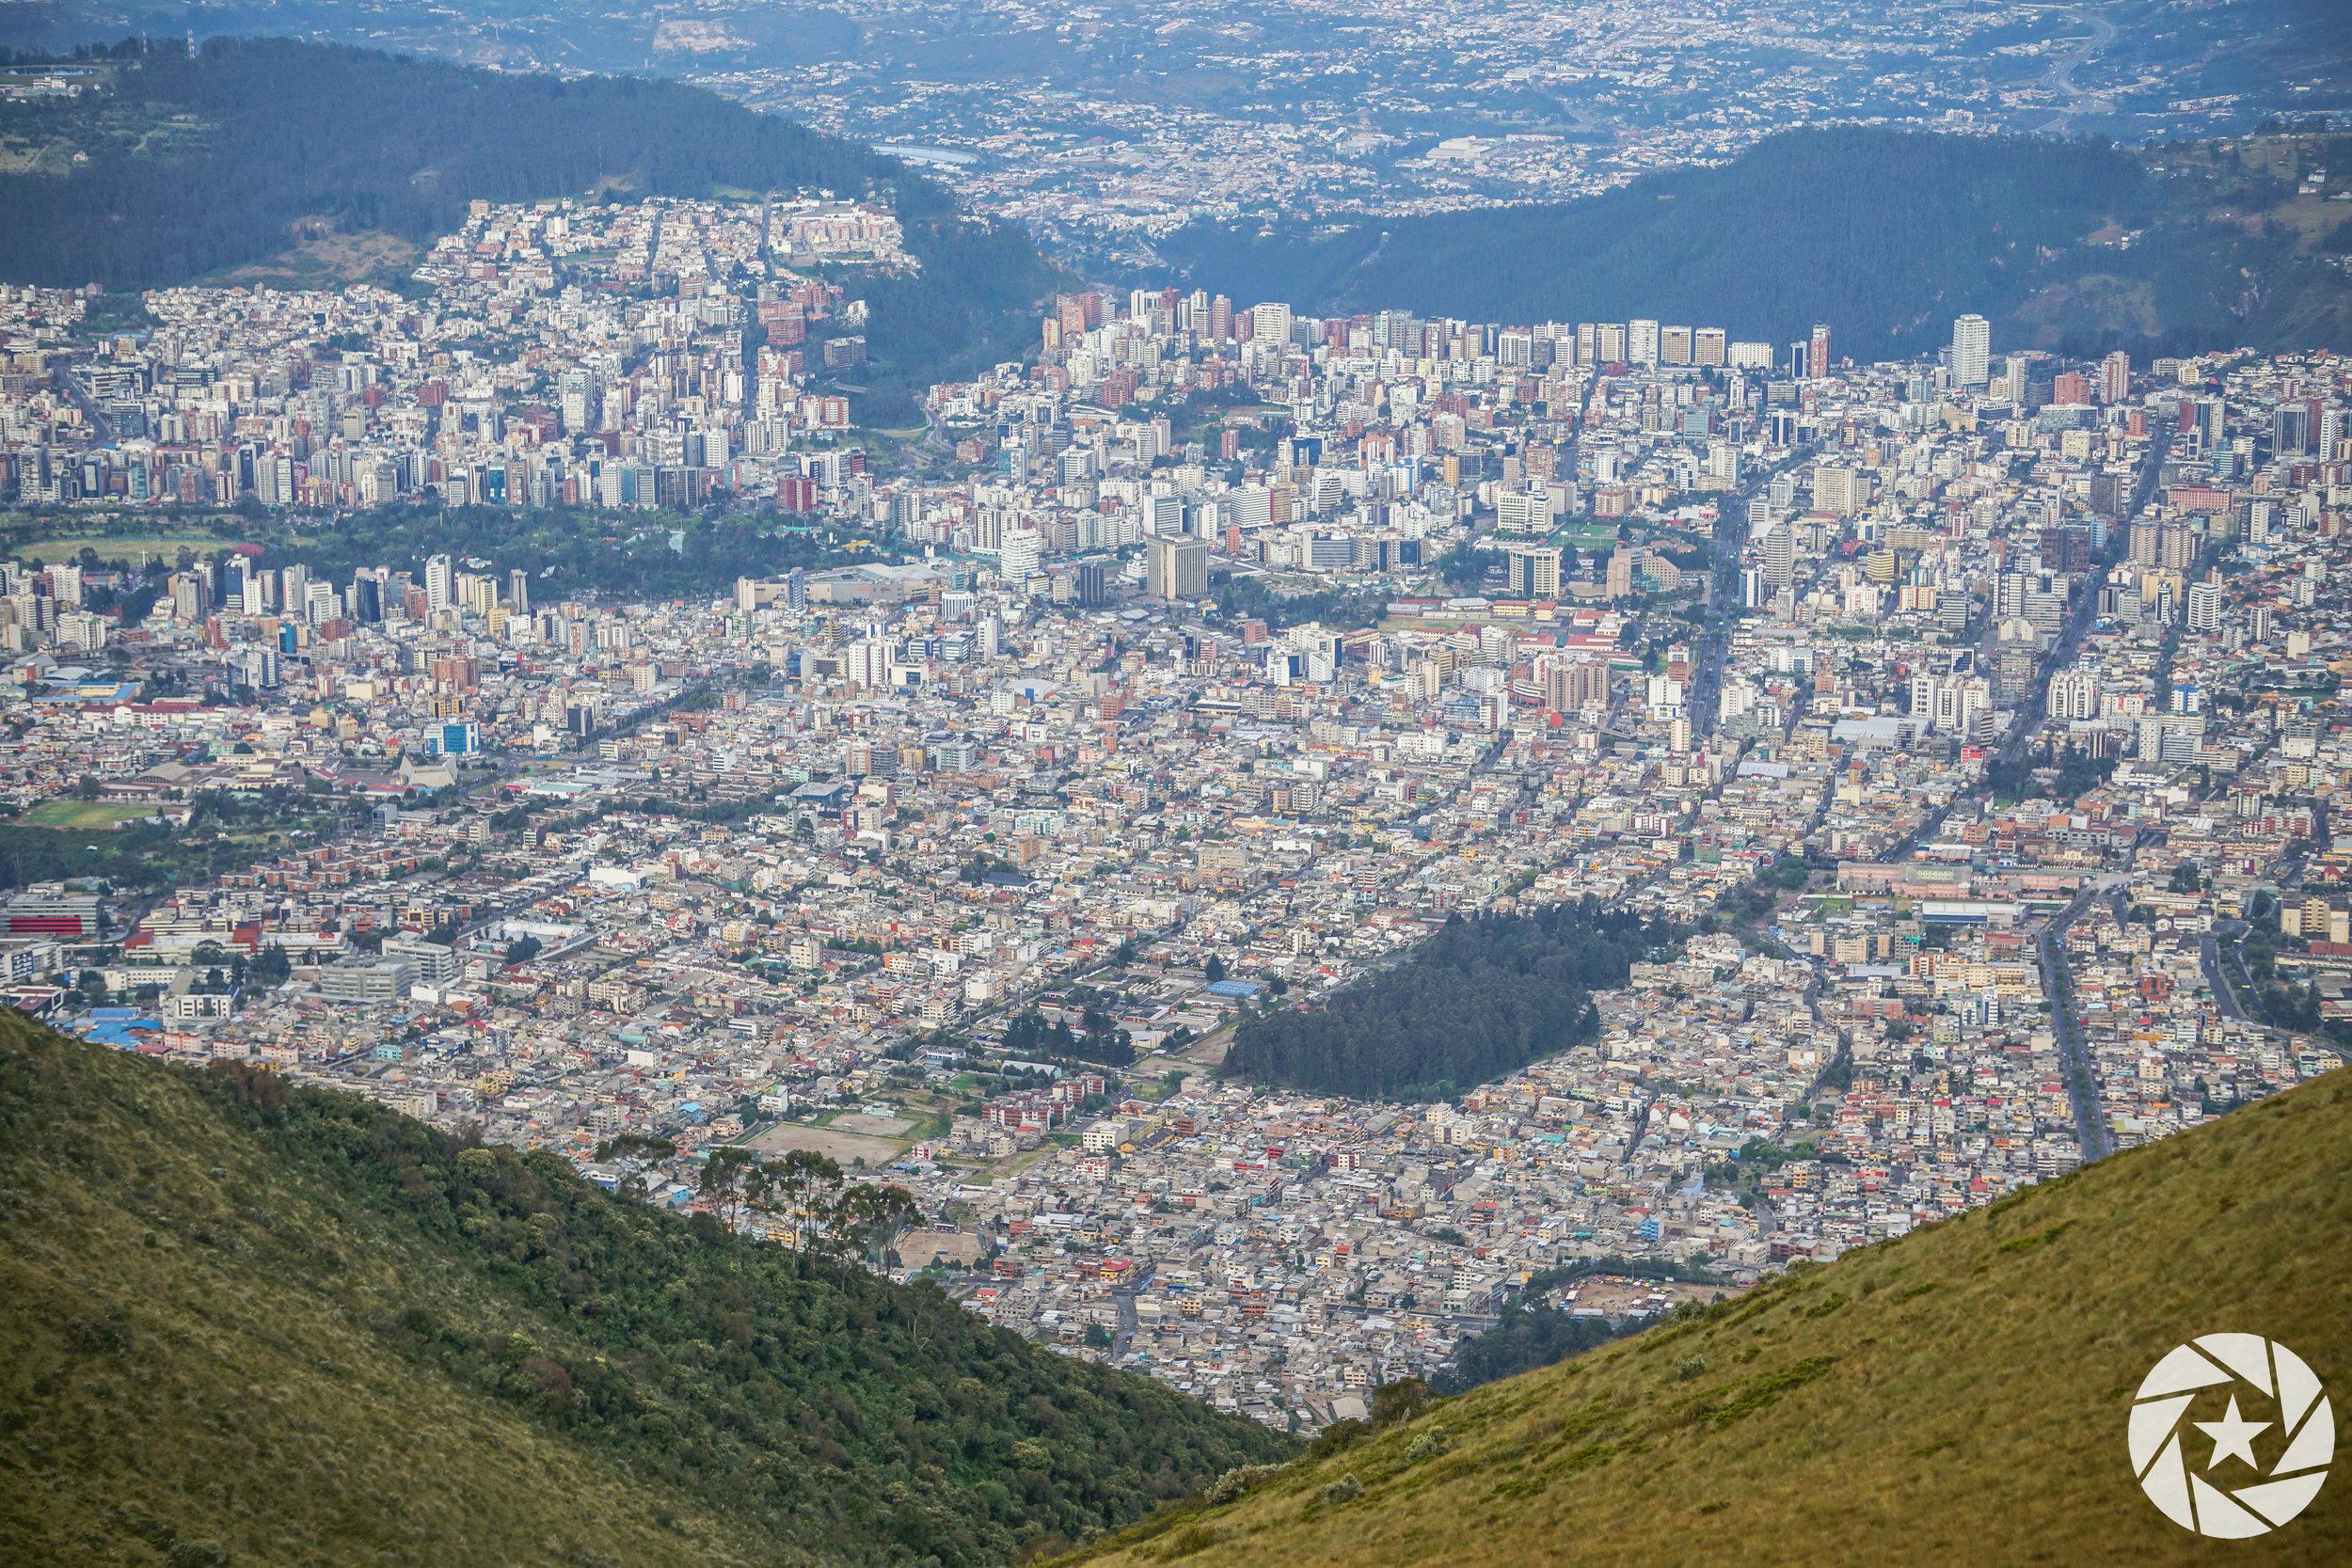 Beautiful view of Quito, Ecuador from Teleferico.